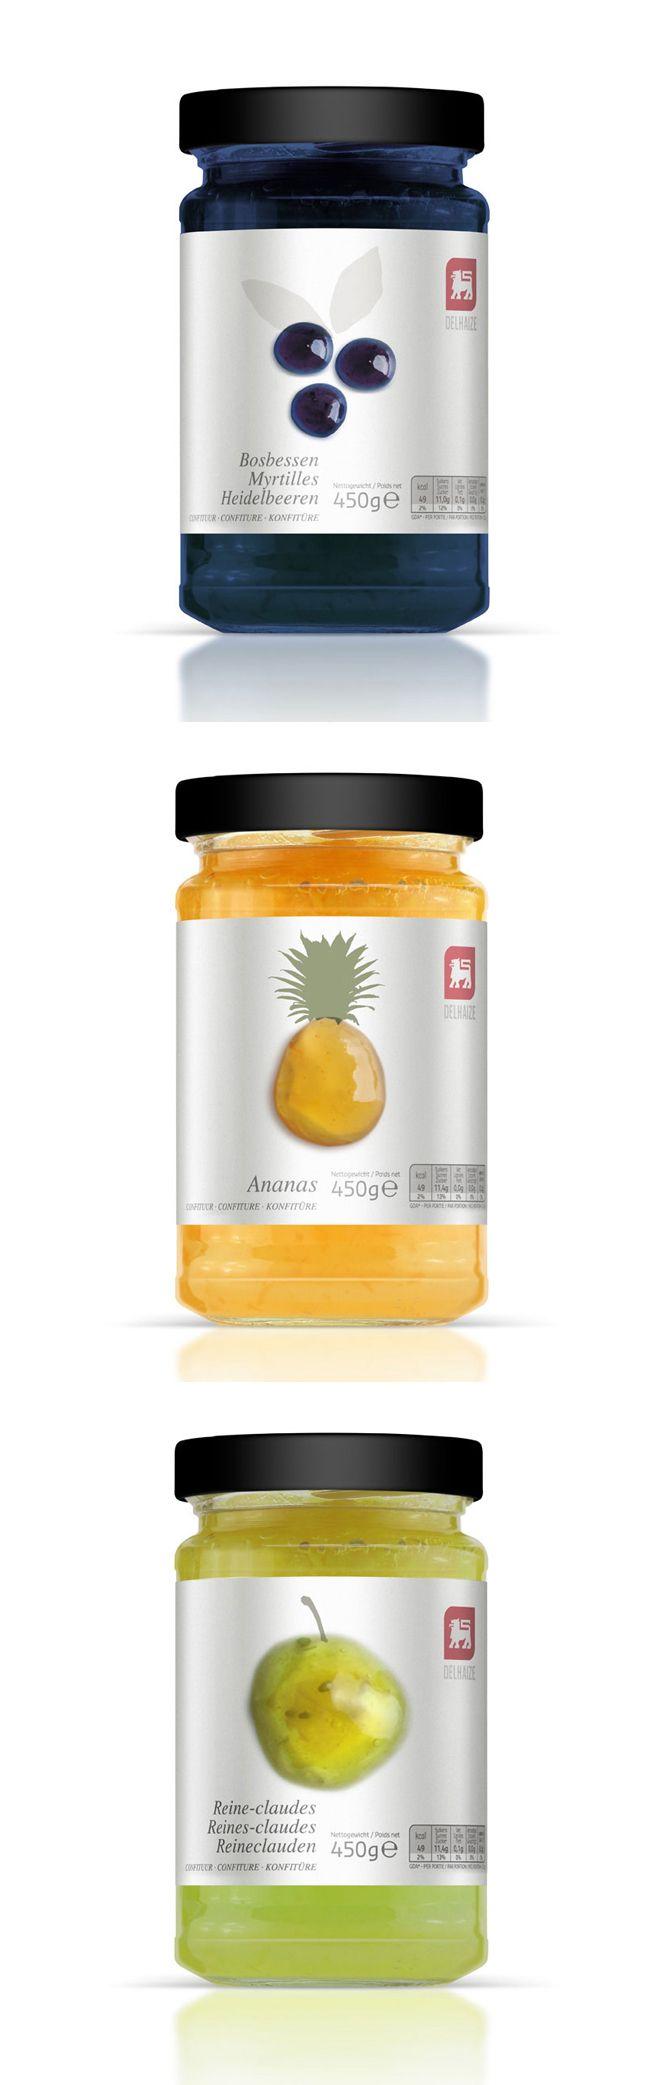 Jam Packaging Designs For Inspiration   We Design Packaging